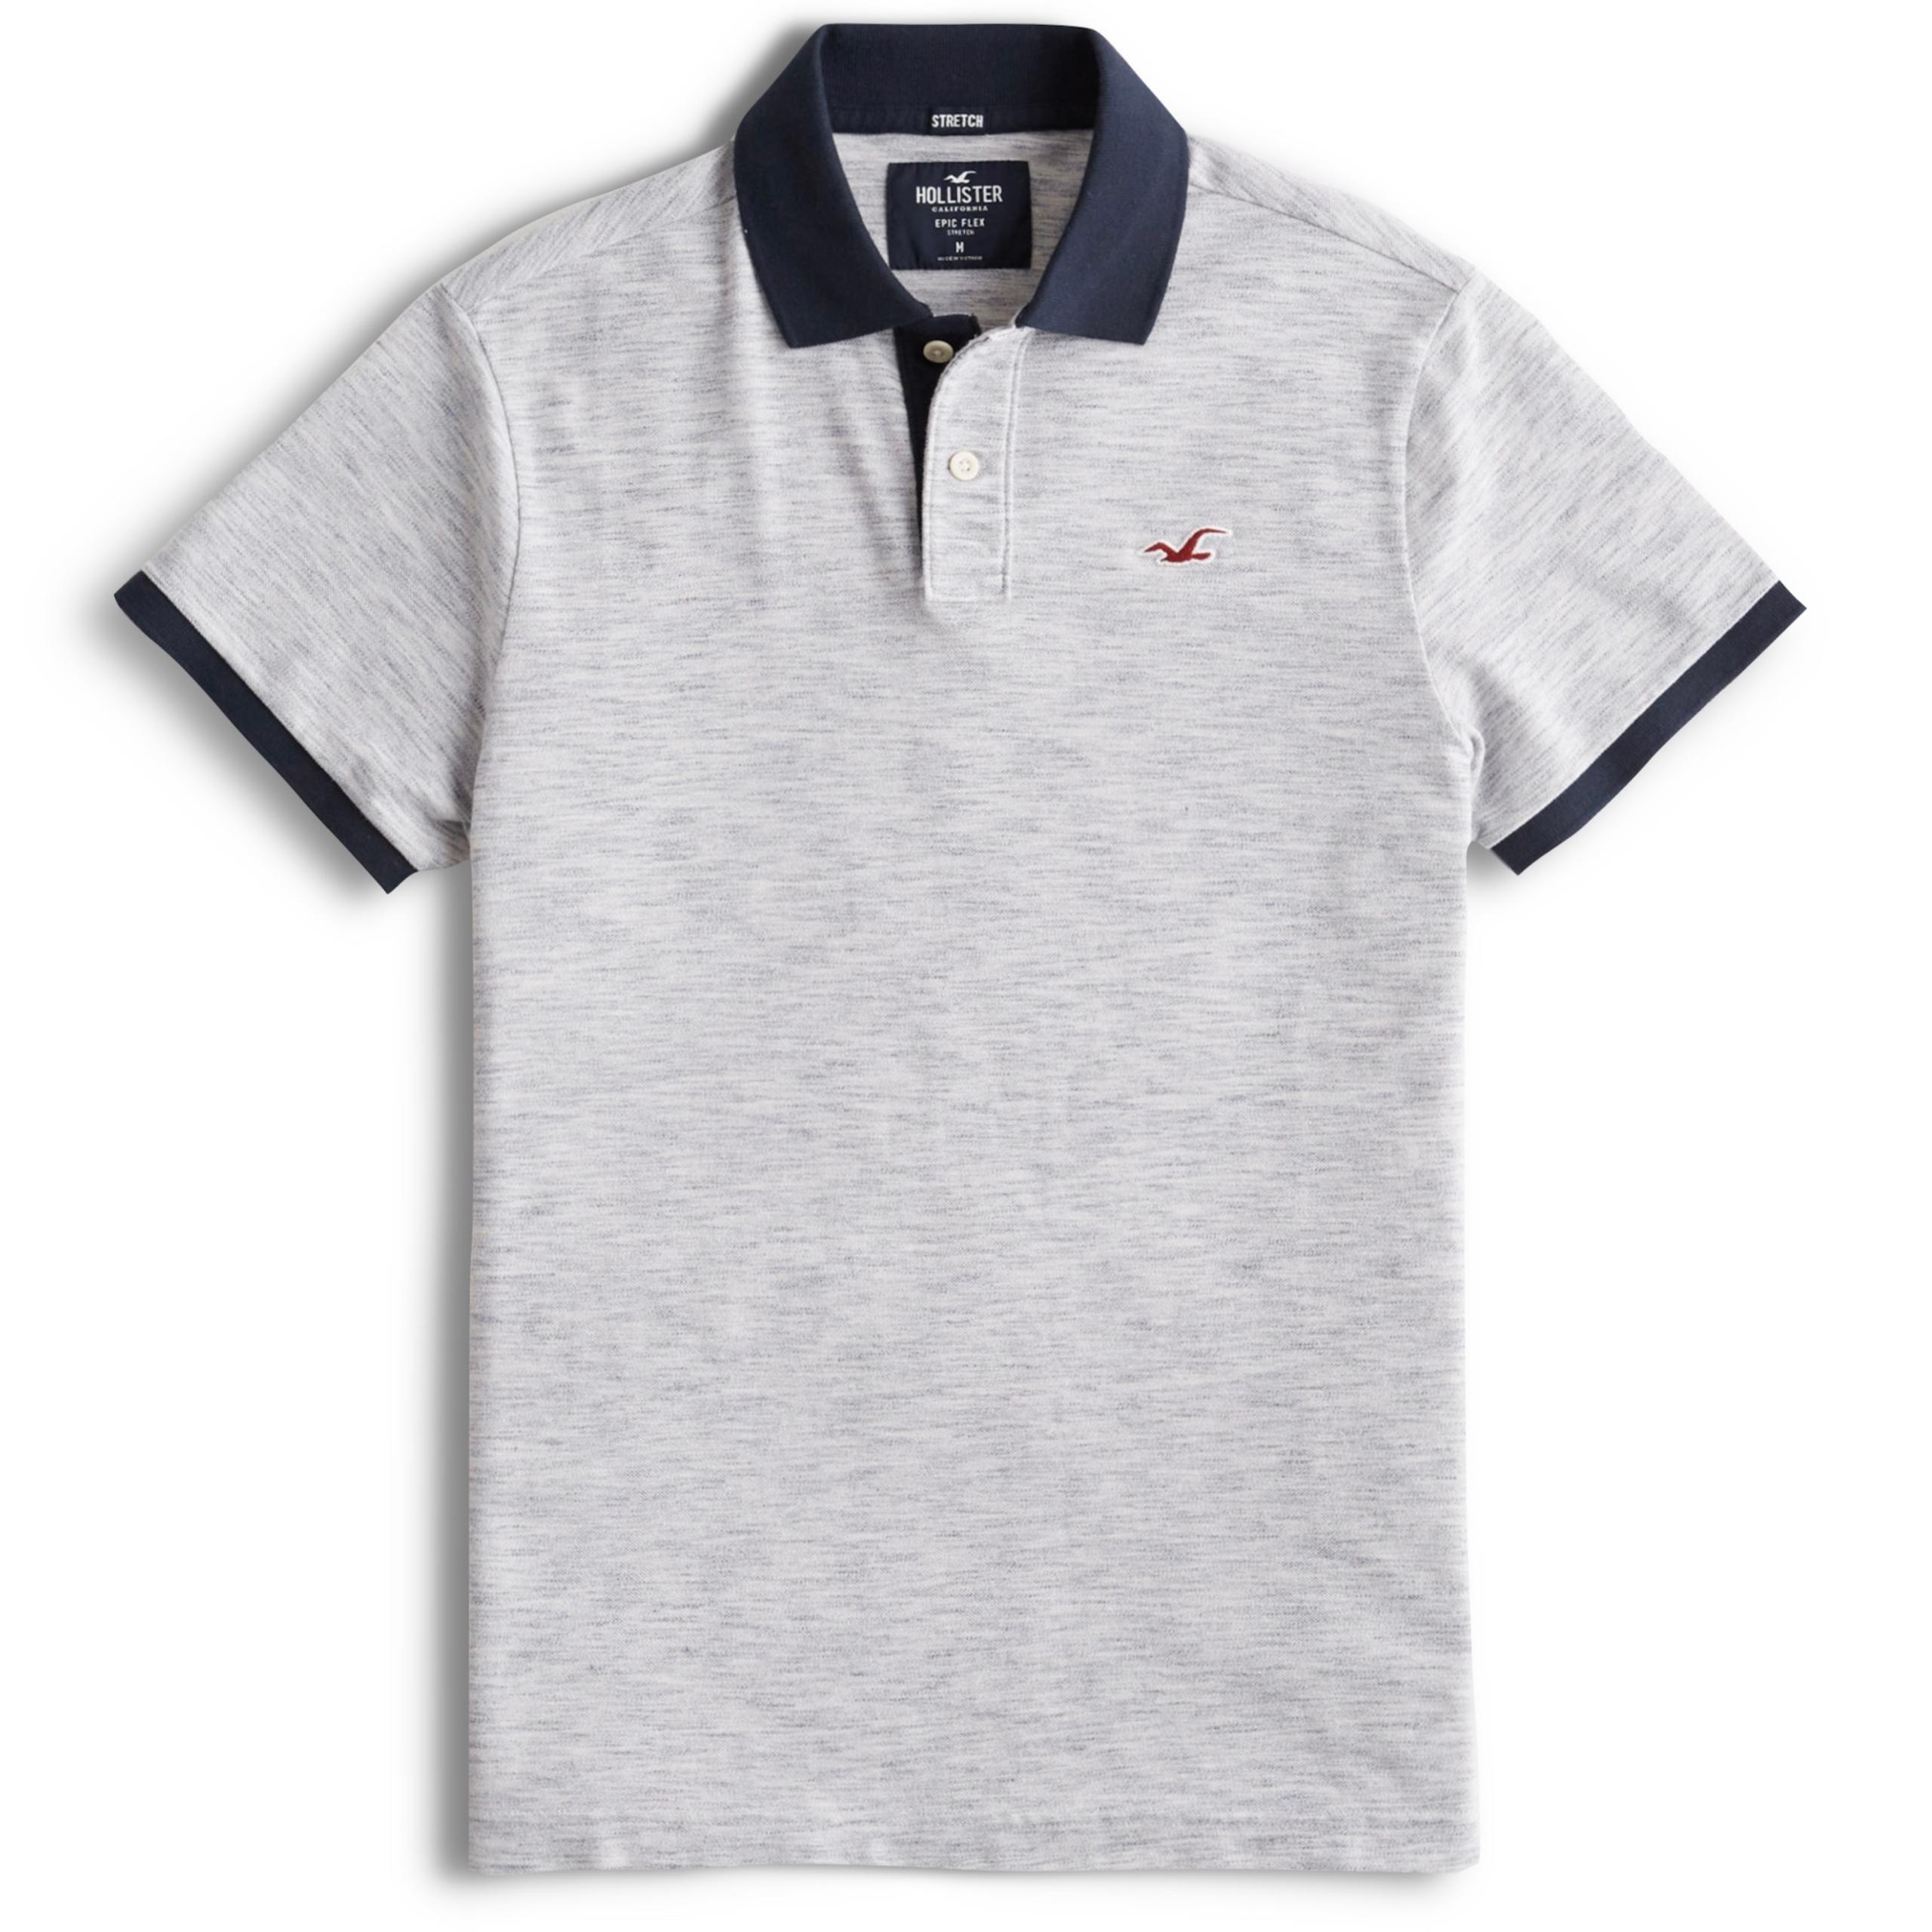 HOLLISTER Abercrombie Koszulka Polo Męska USA L